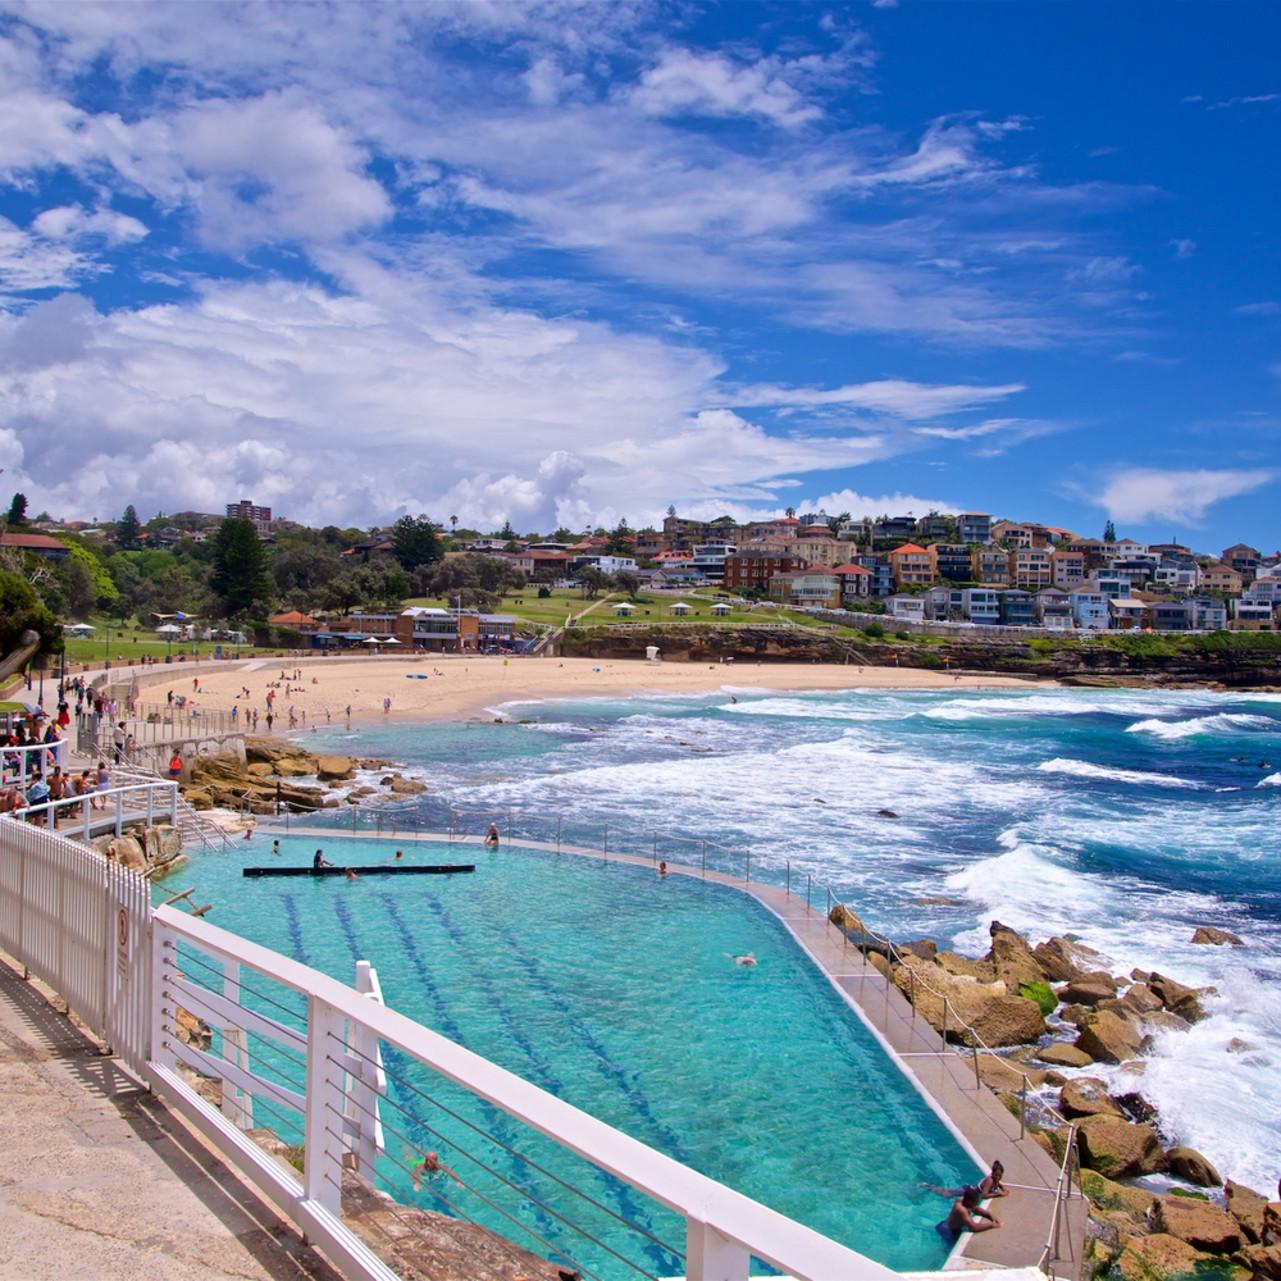 Bronte belle bronte beach sydney nsw australia k6rrag